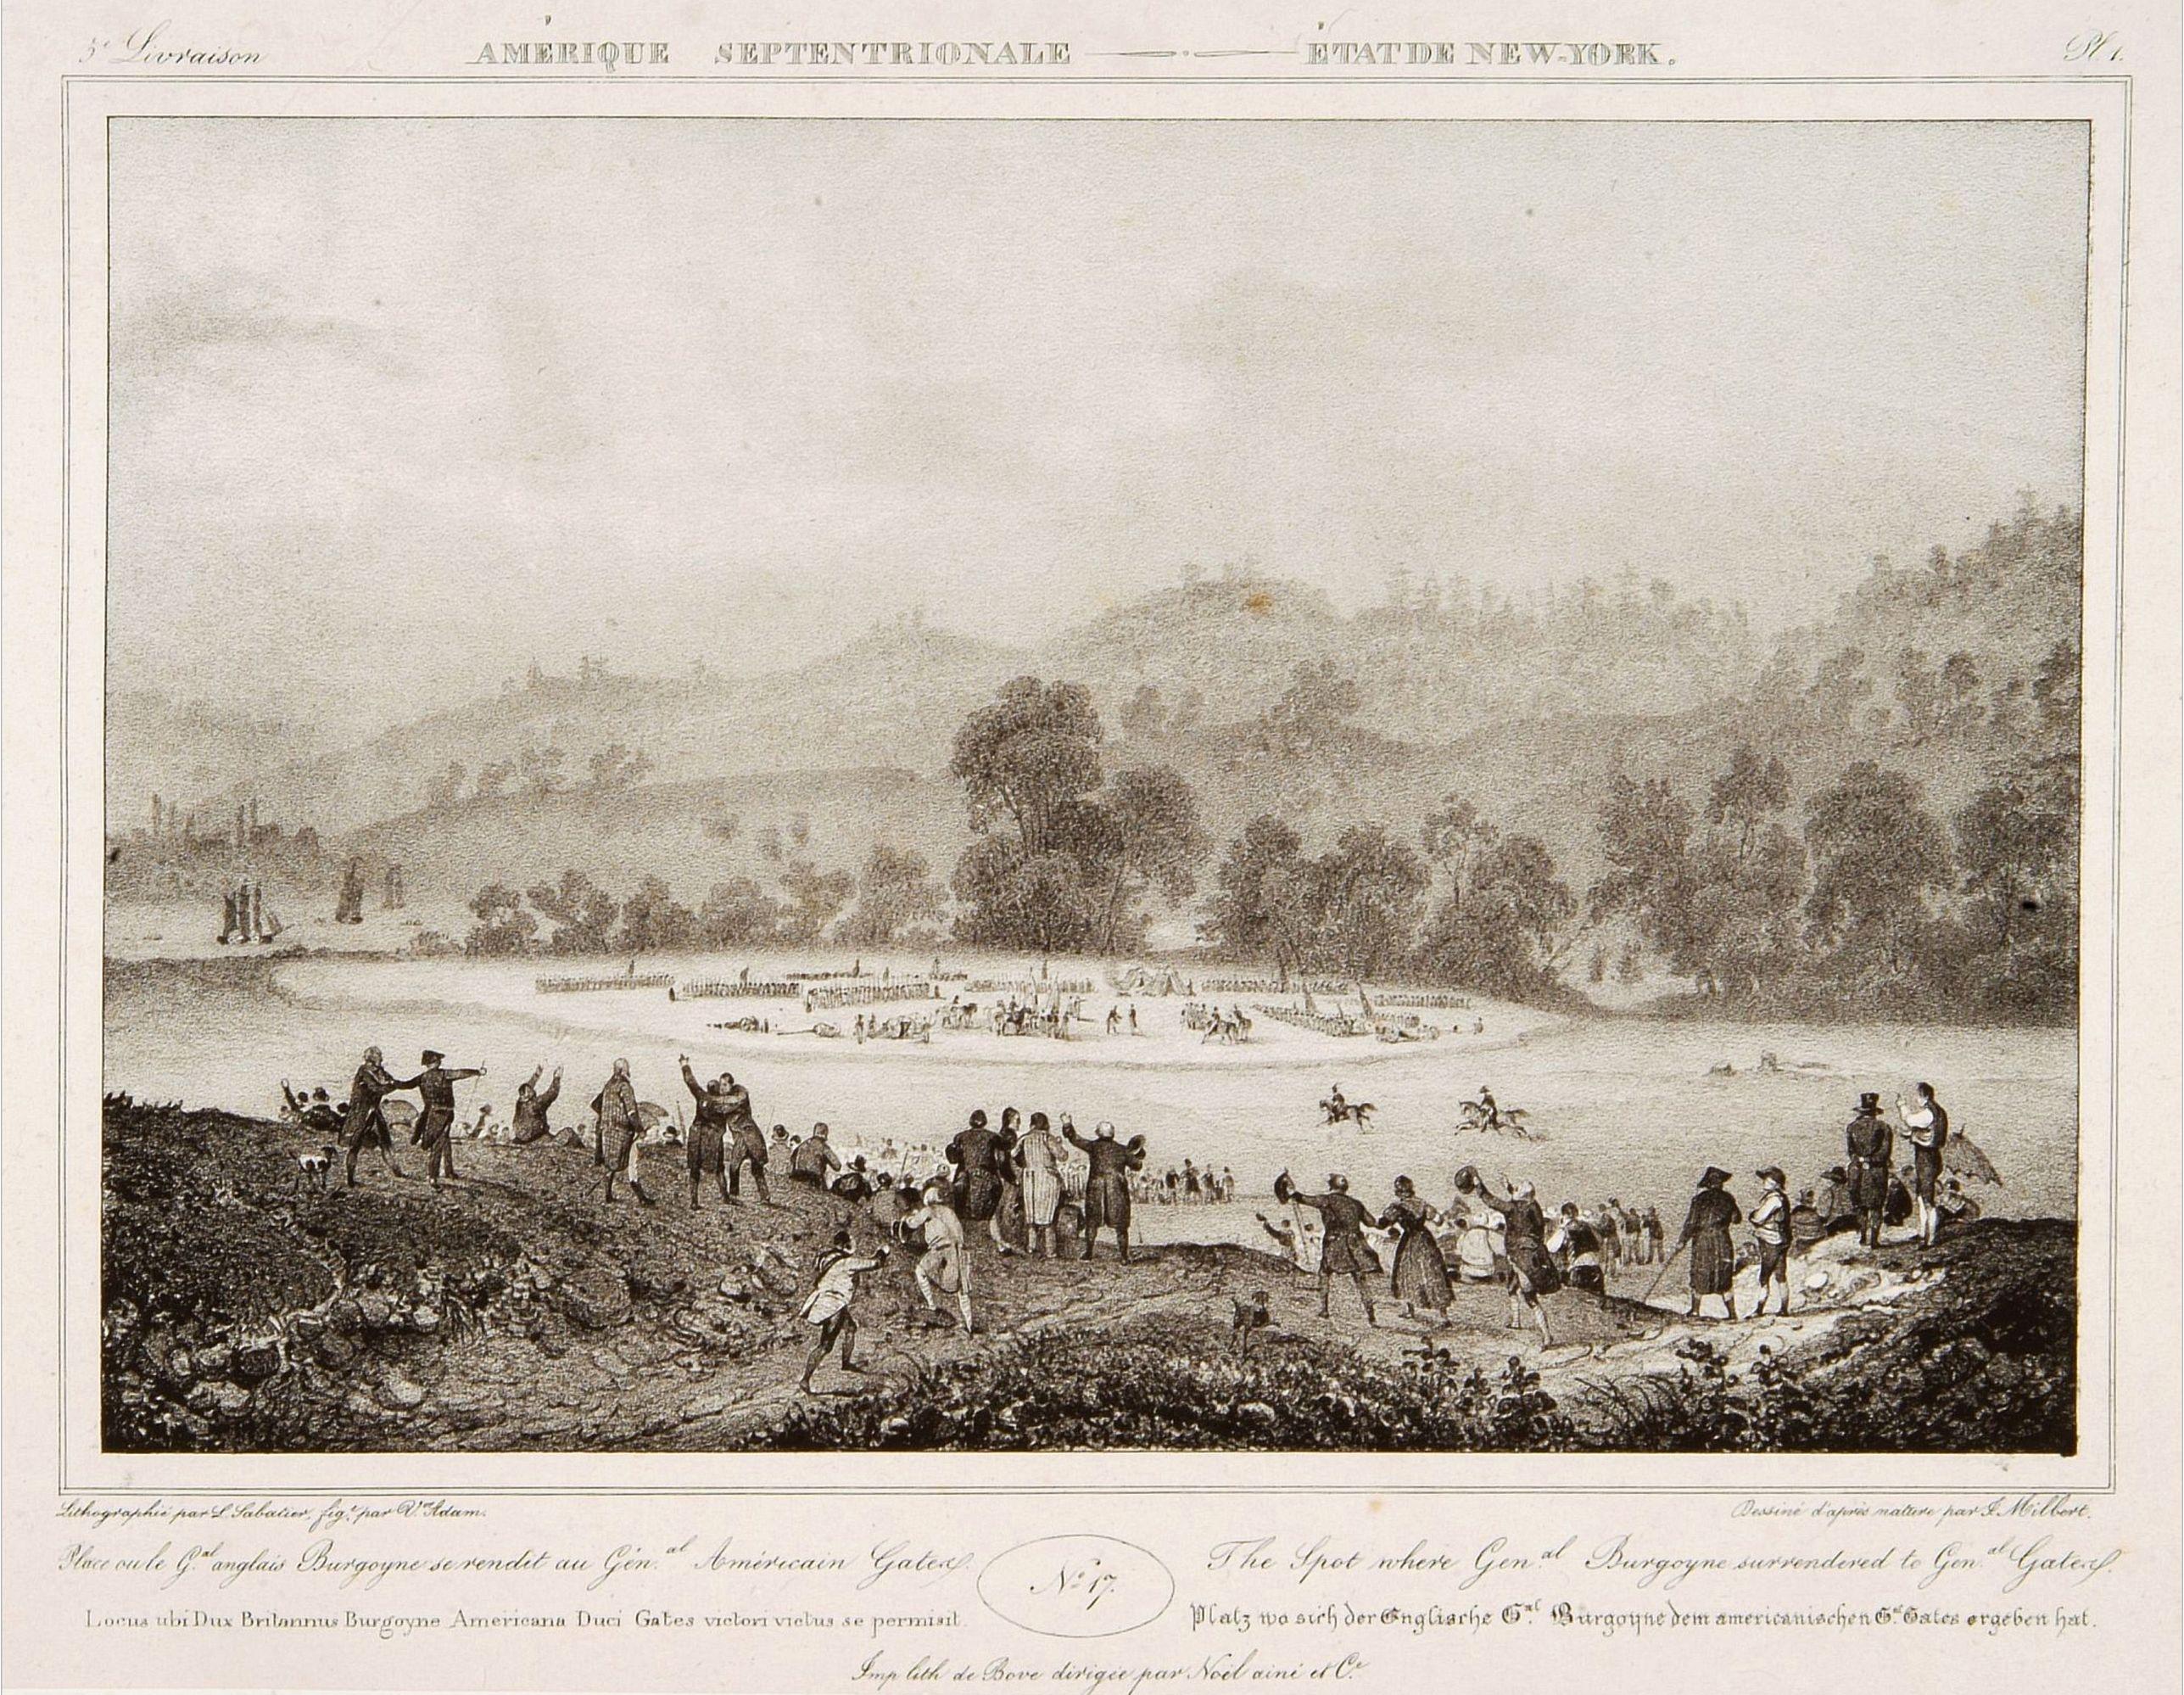 MILBERT, J. -  The spot where General Burgoyne surrendered to General Gates.